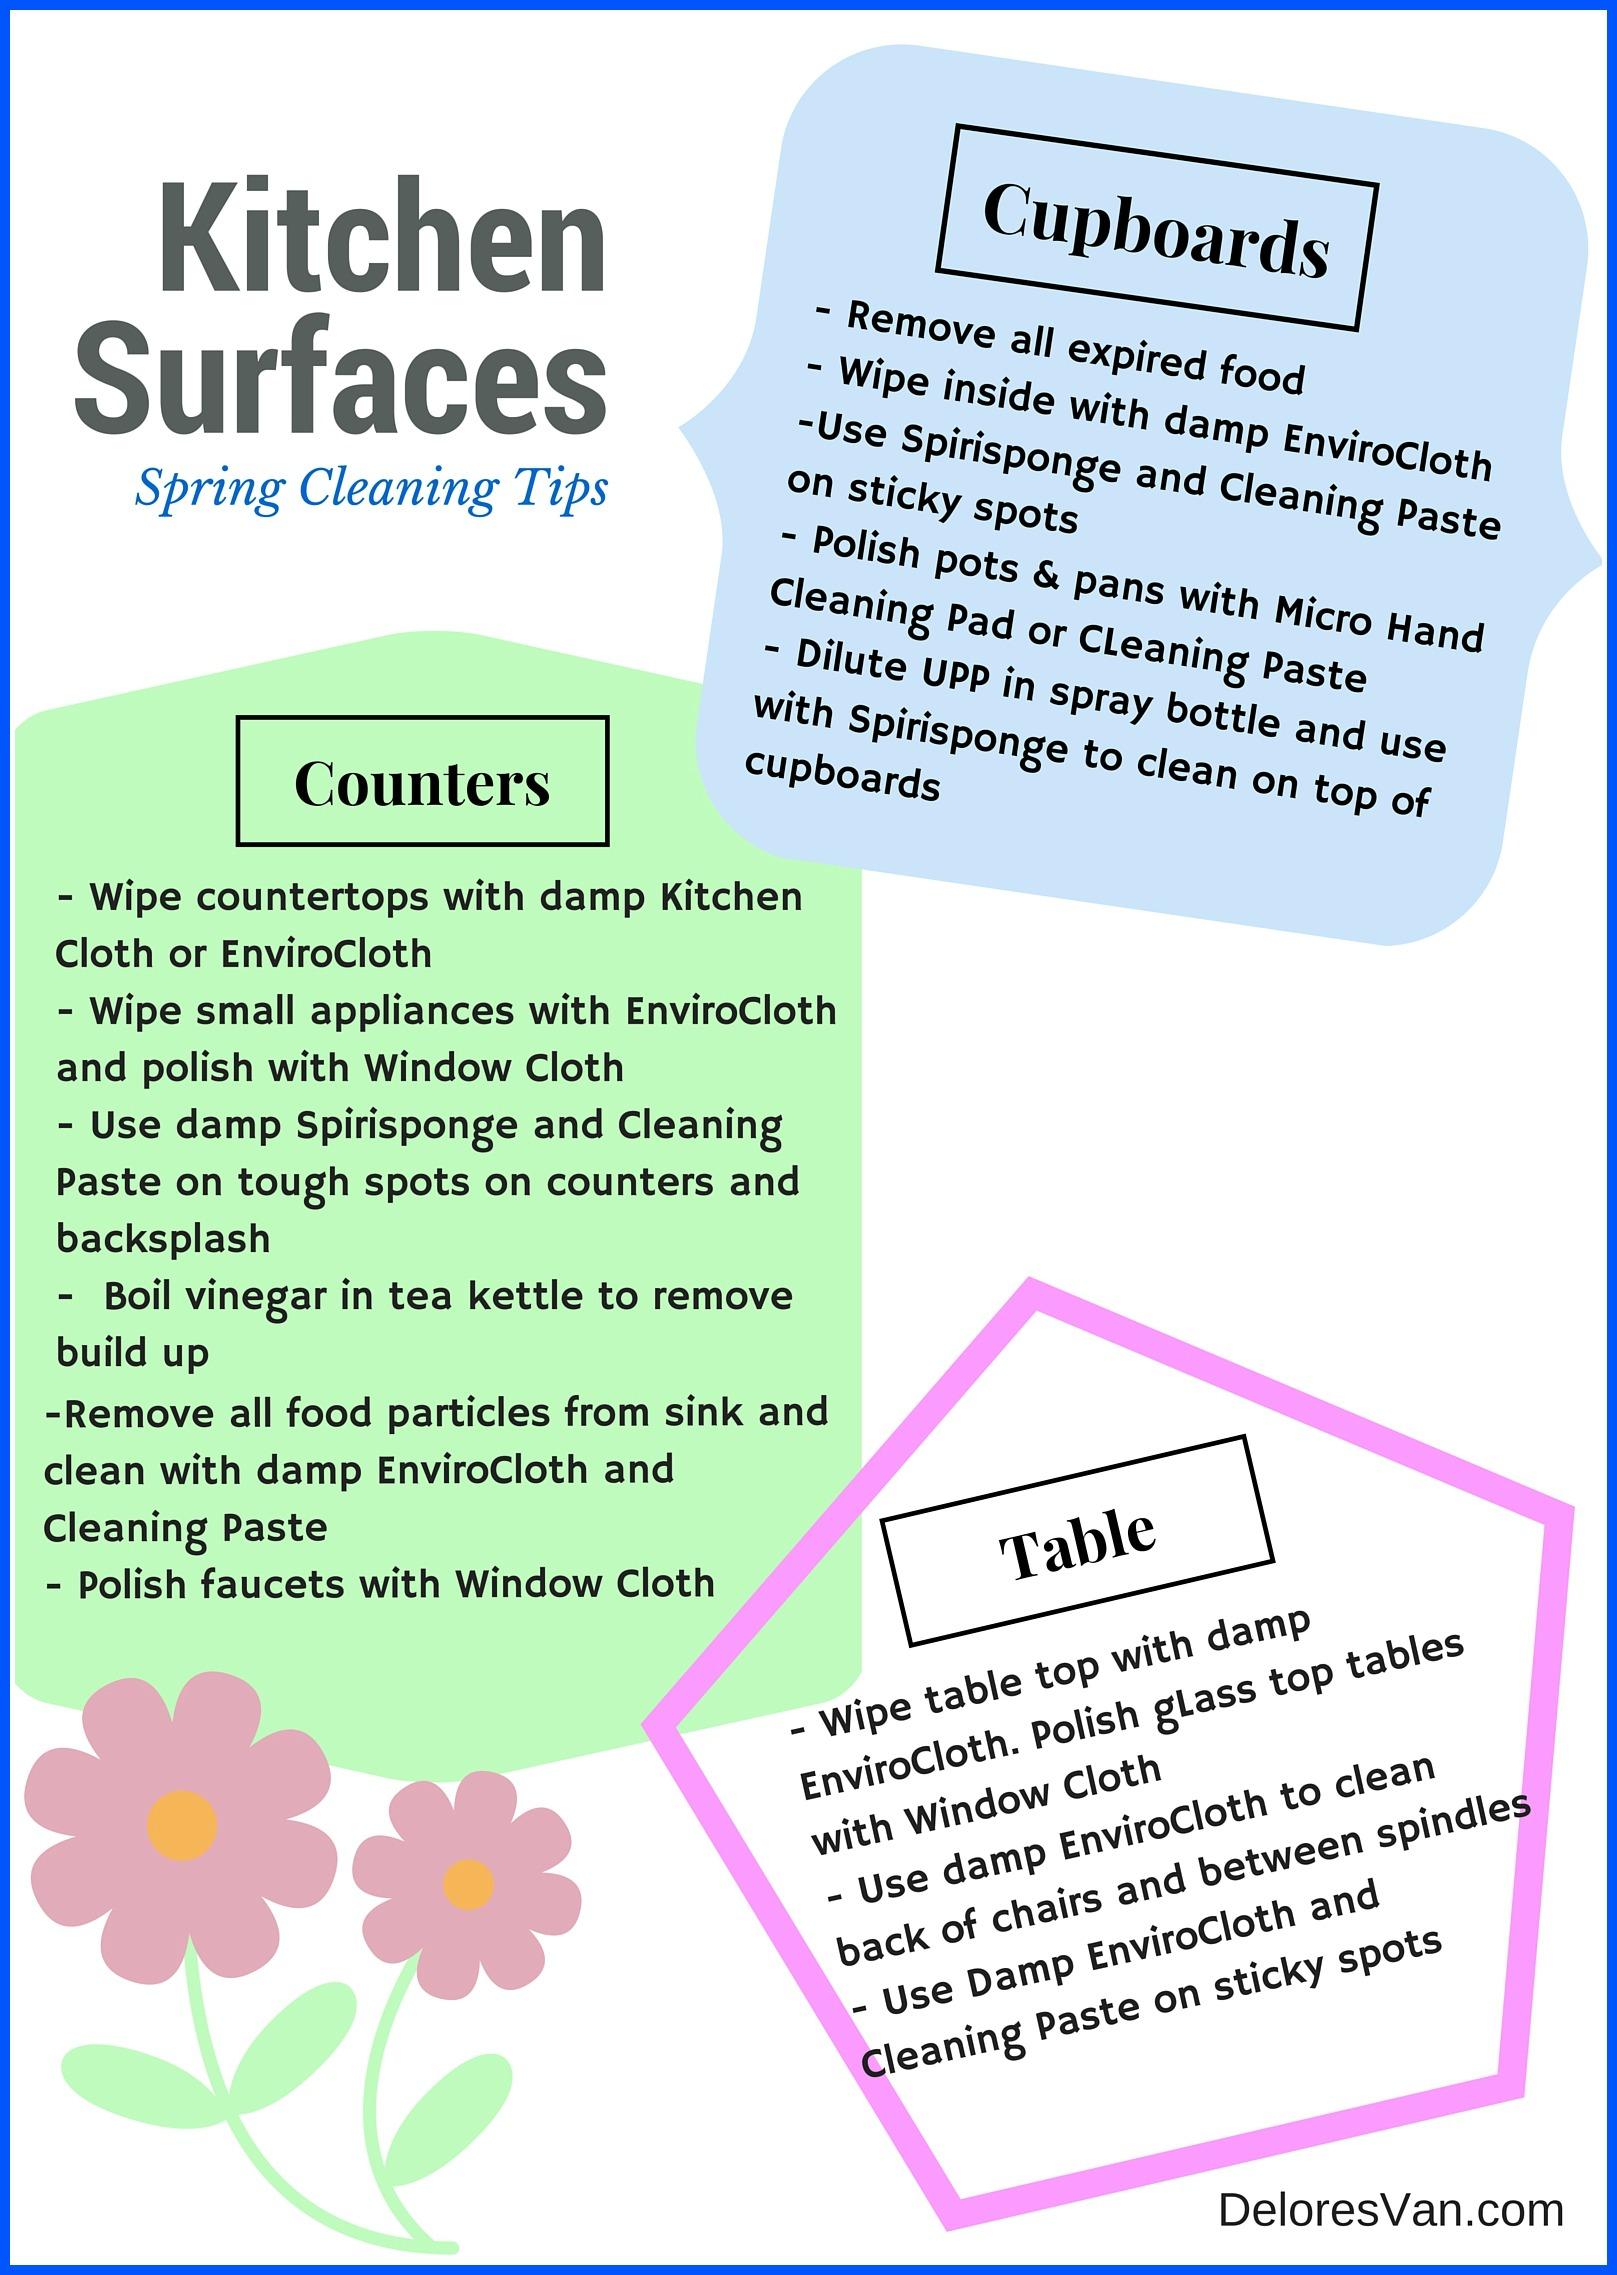 How To Clean Granite Countertops: